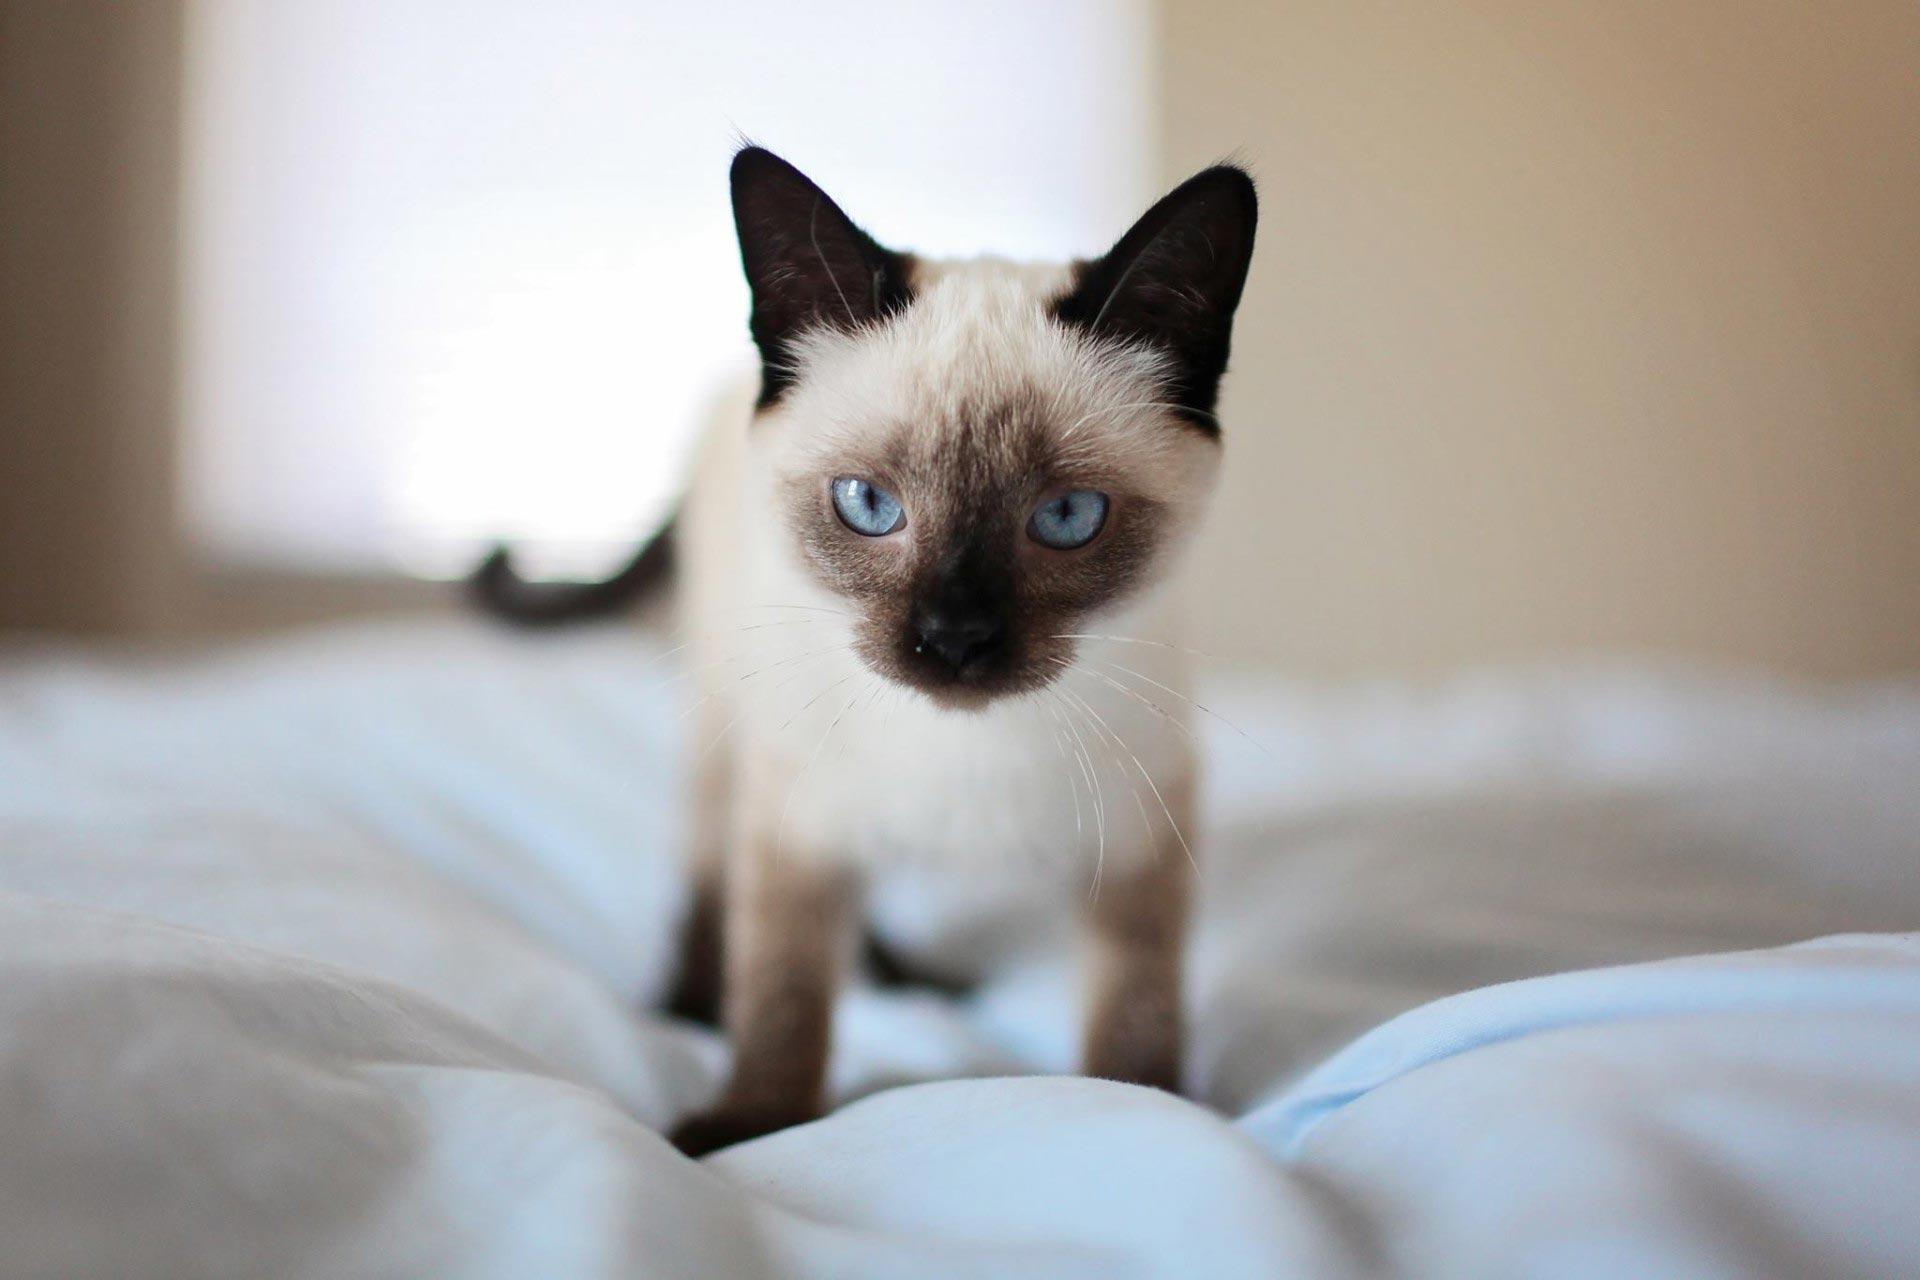 Красивые сиамские котята картинки - подборка изображений 7